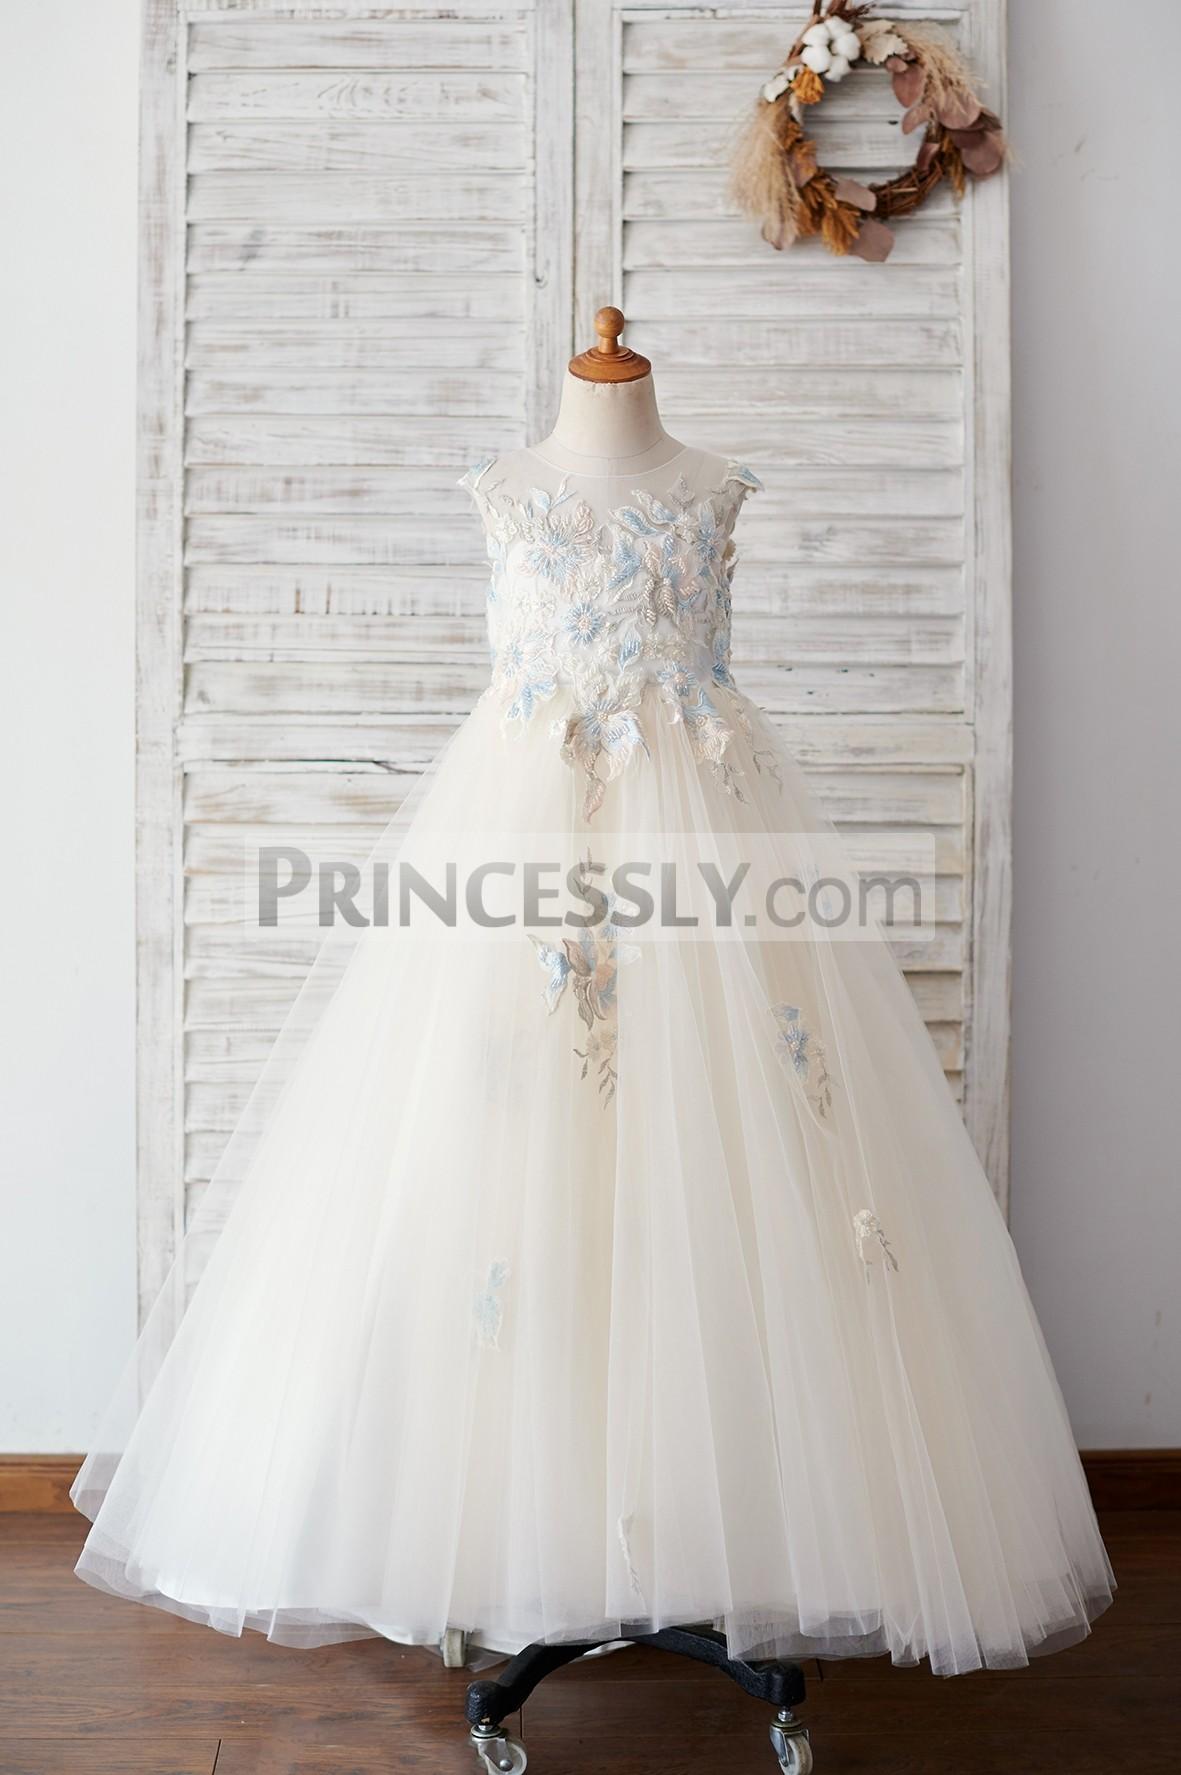 Princessly.com-K1003889-Champagne Tulle Beaded Lace V Back Wedding Flower Girl Dress-32